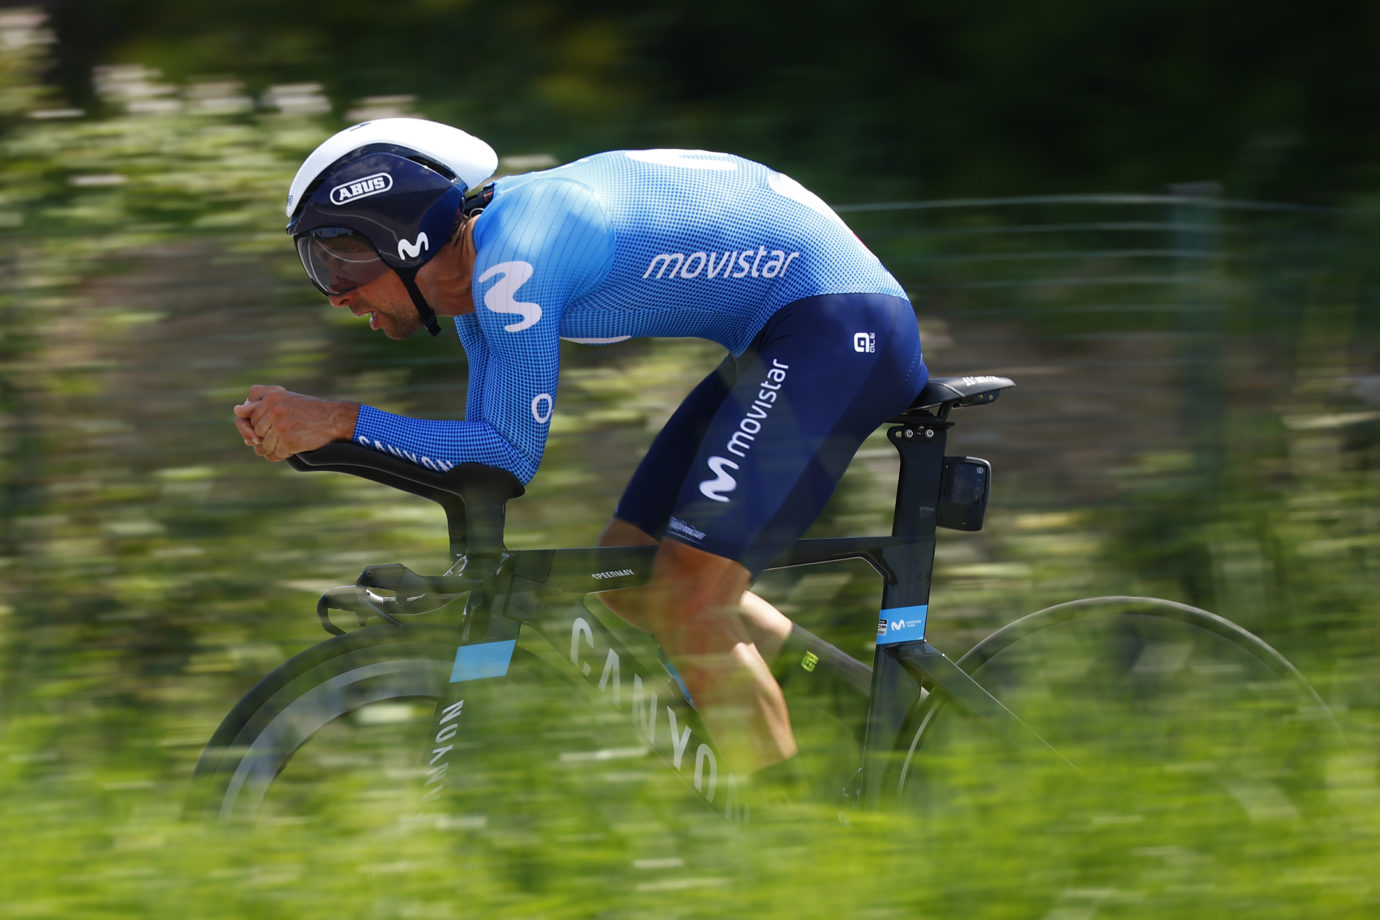 Imagen de la noticia '26 National Championships: the Movistar Team's most intense week to date'